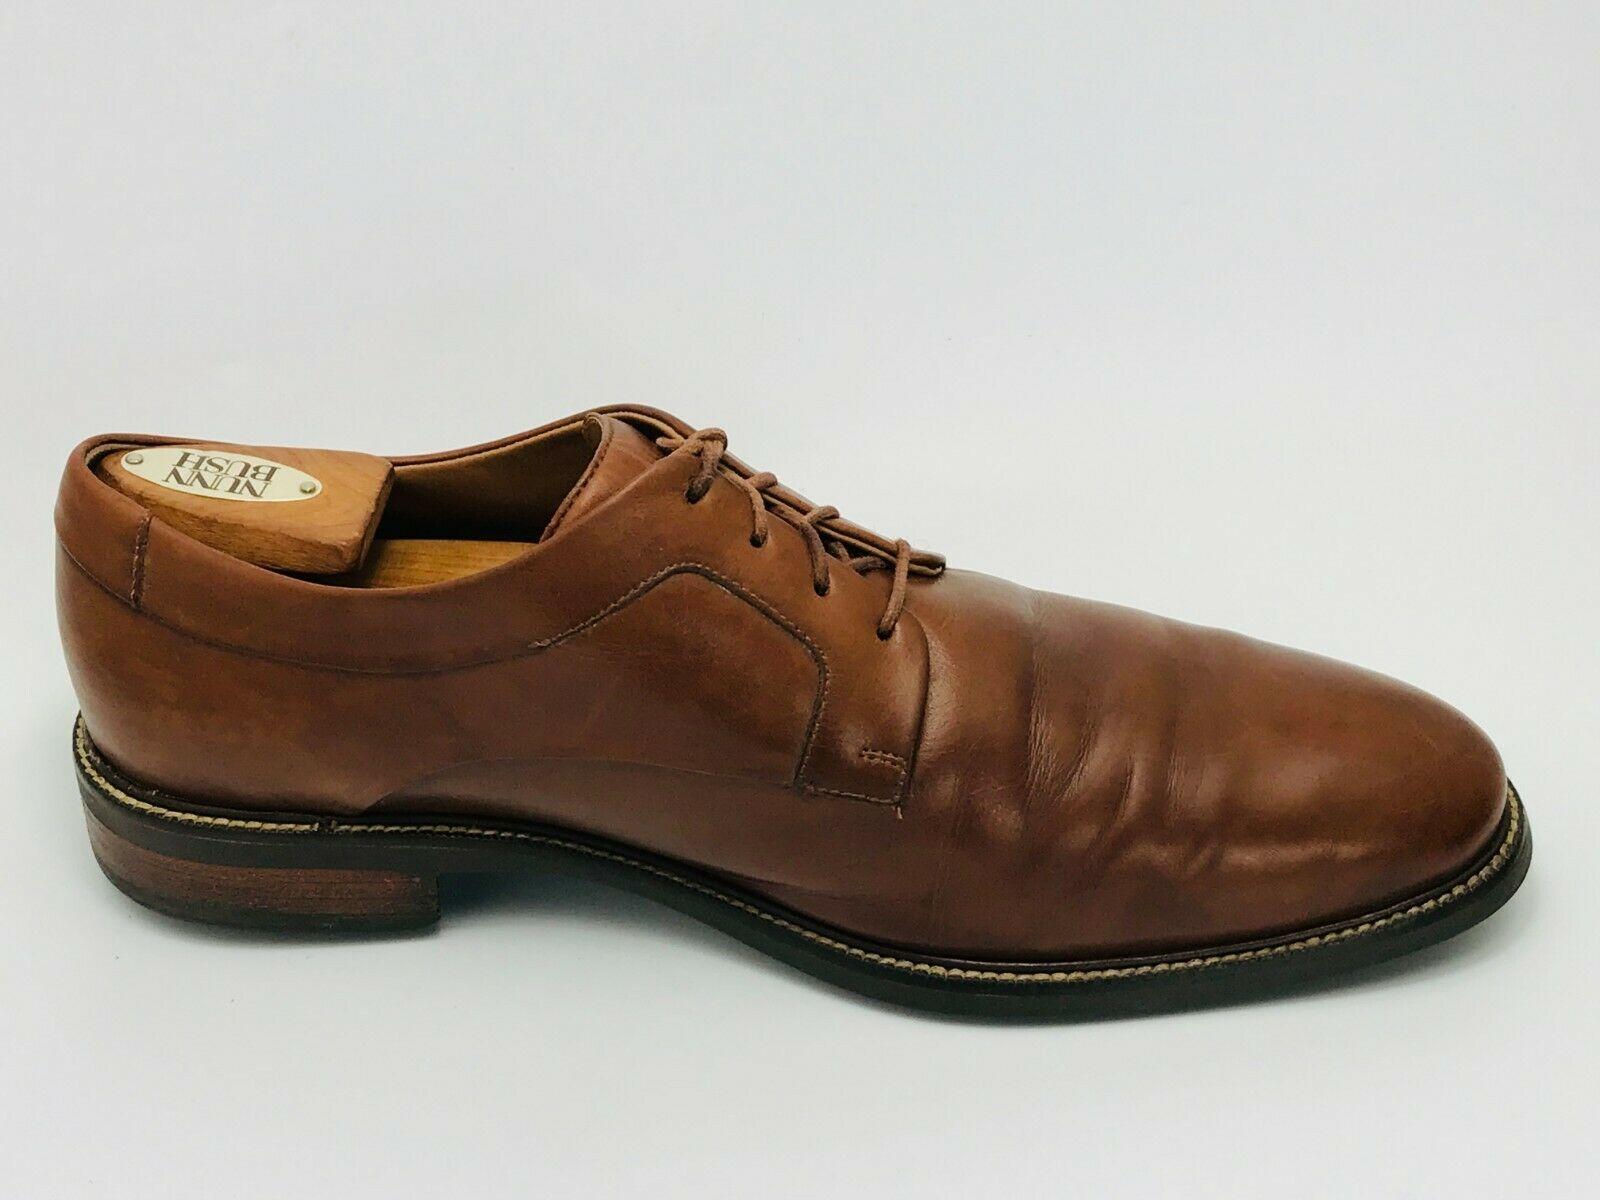 Cole Haan Men's Warren Cap Toe Oxford Brown Leather Size 10.5W